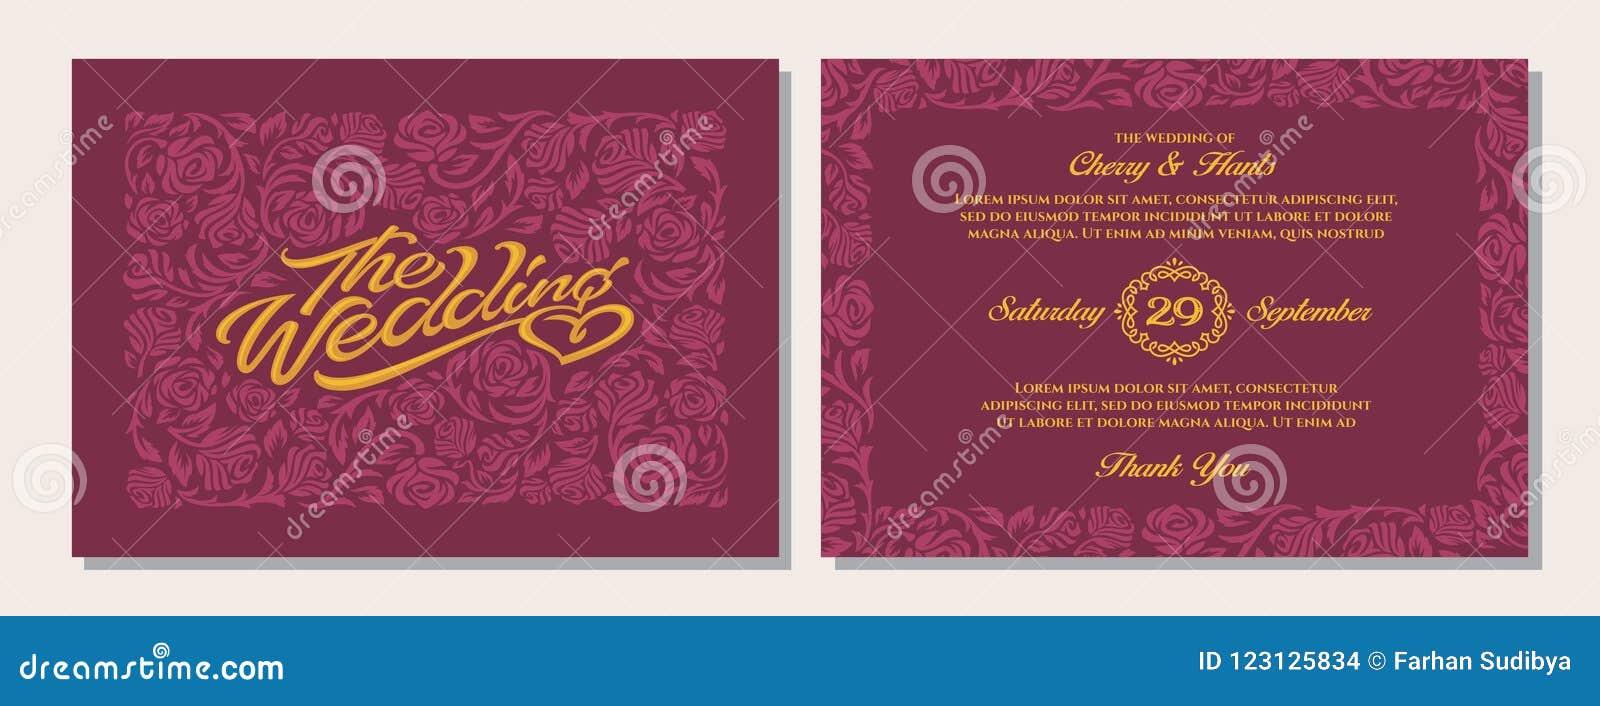 Luxury Wedding Invitation Templates Red Maroon Background